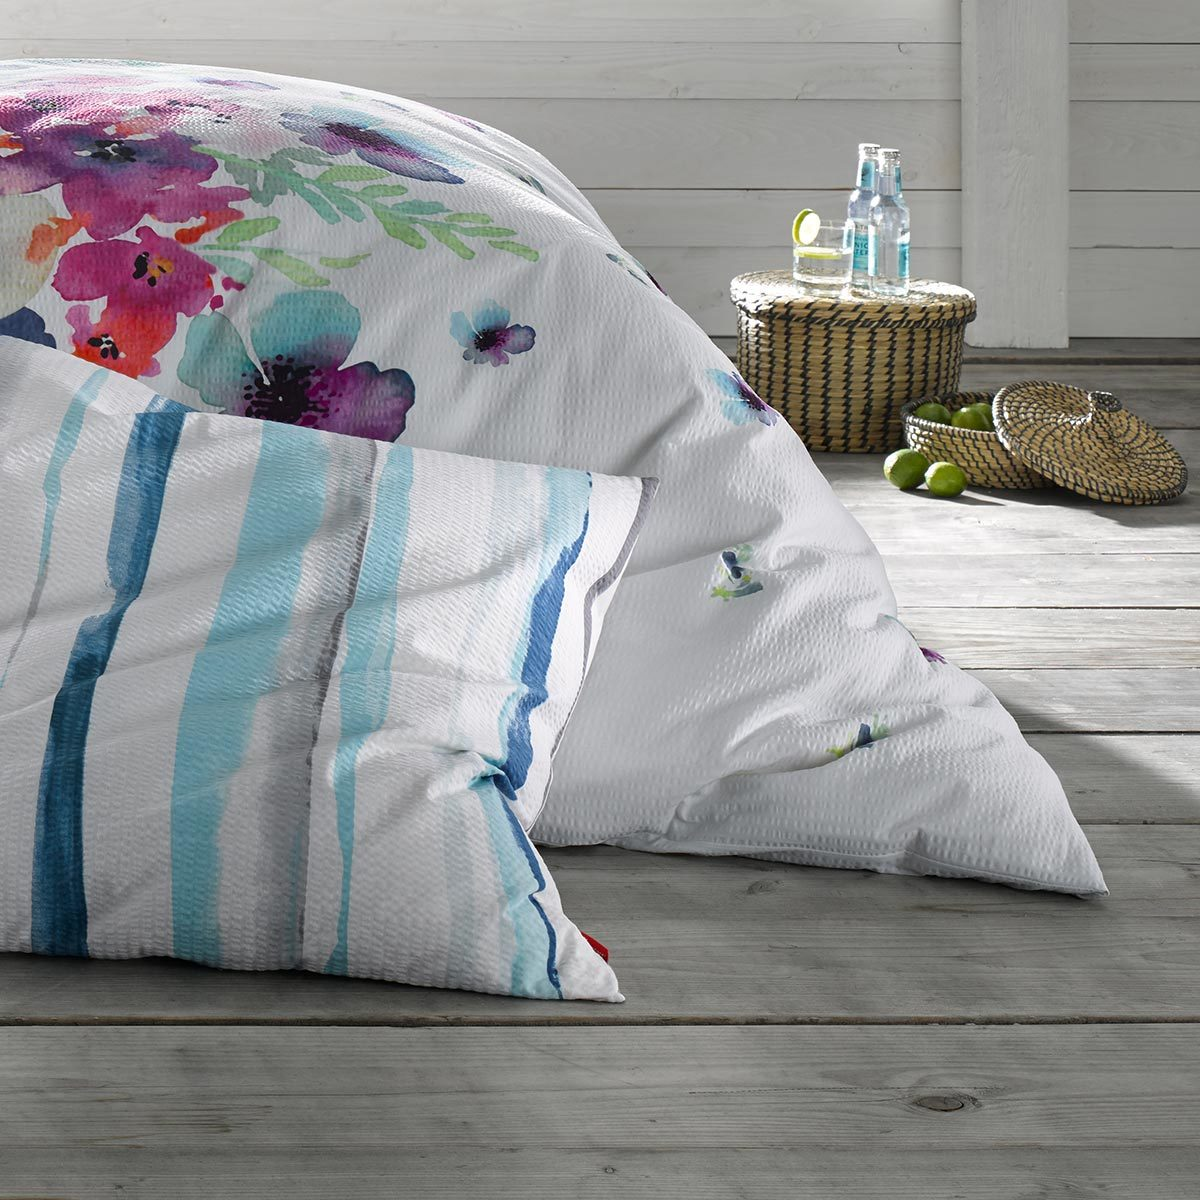 fleuresse seersucker bettw sche bali 493866 09 g nstig online kaufen bei bettwaren shop. Black Bedroom Furniture Sets. Home Design Ideas